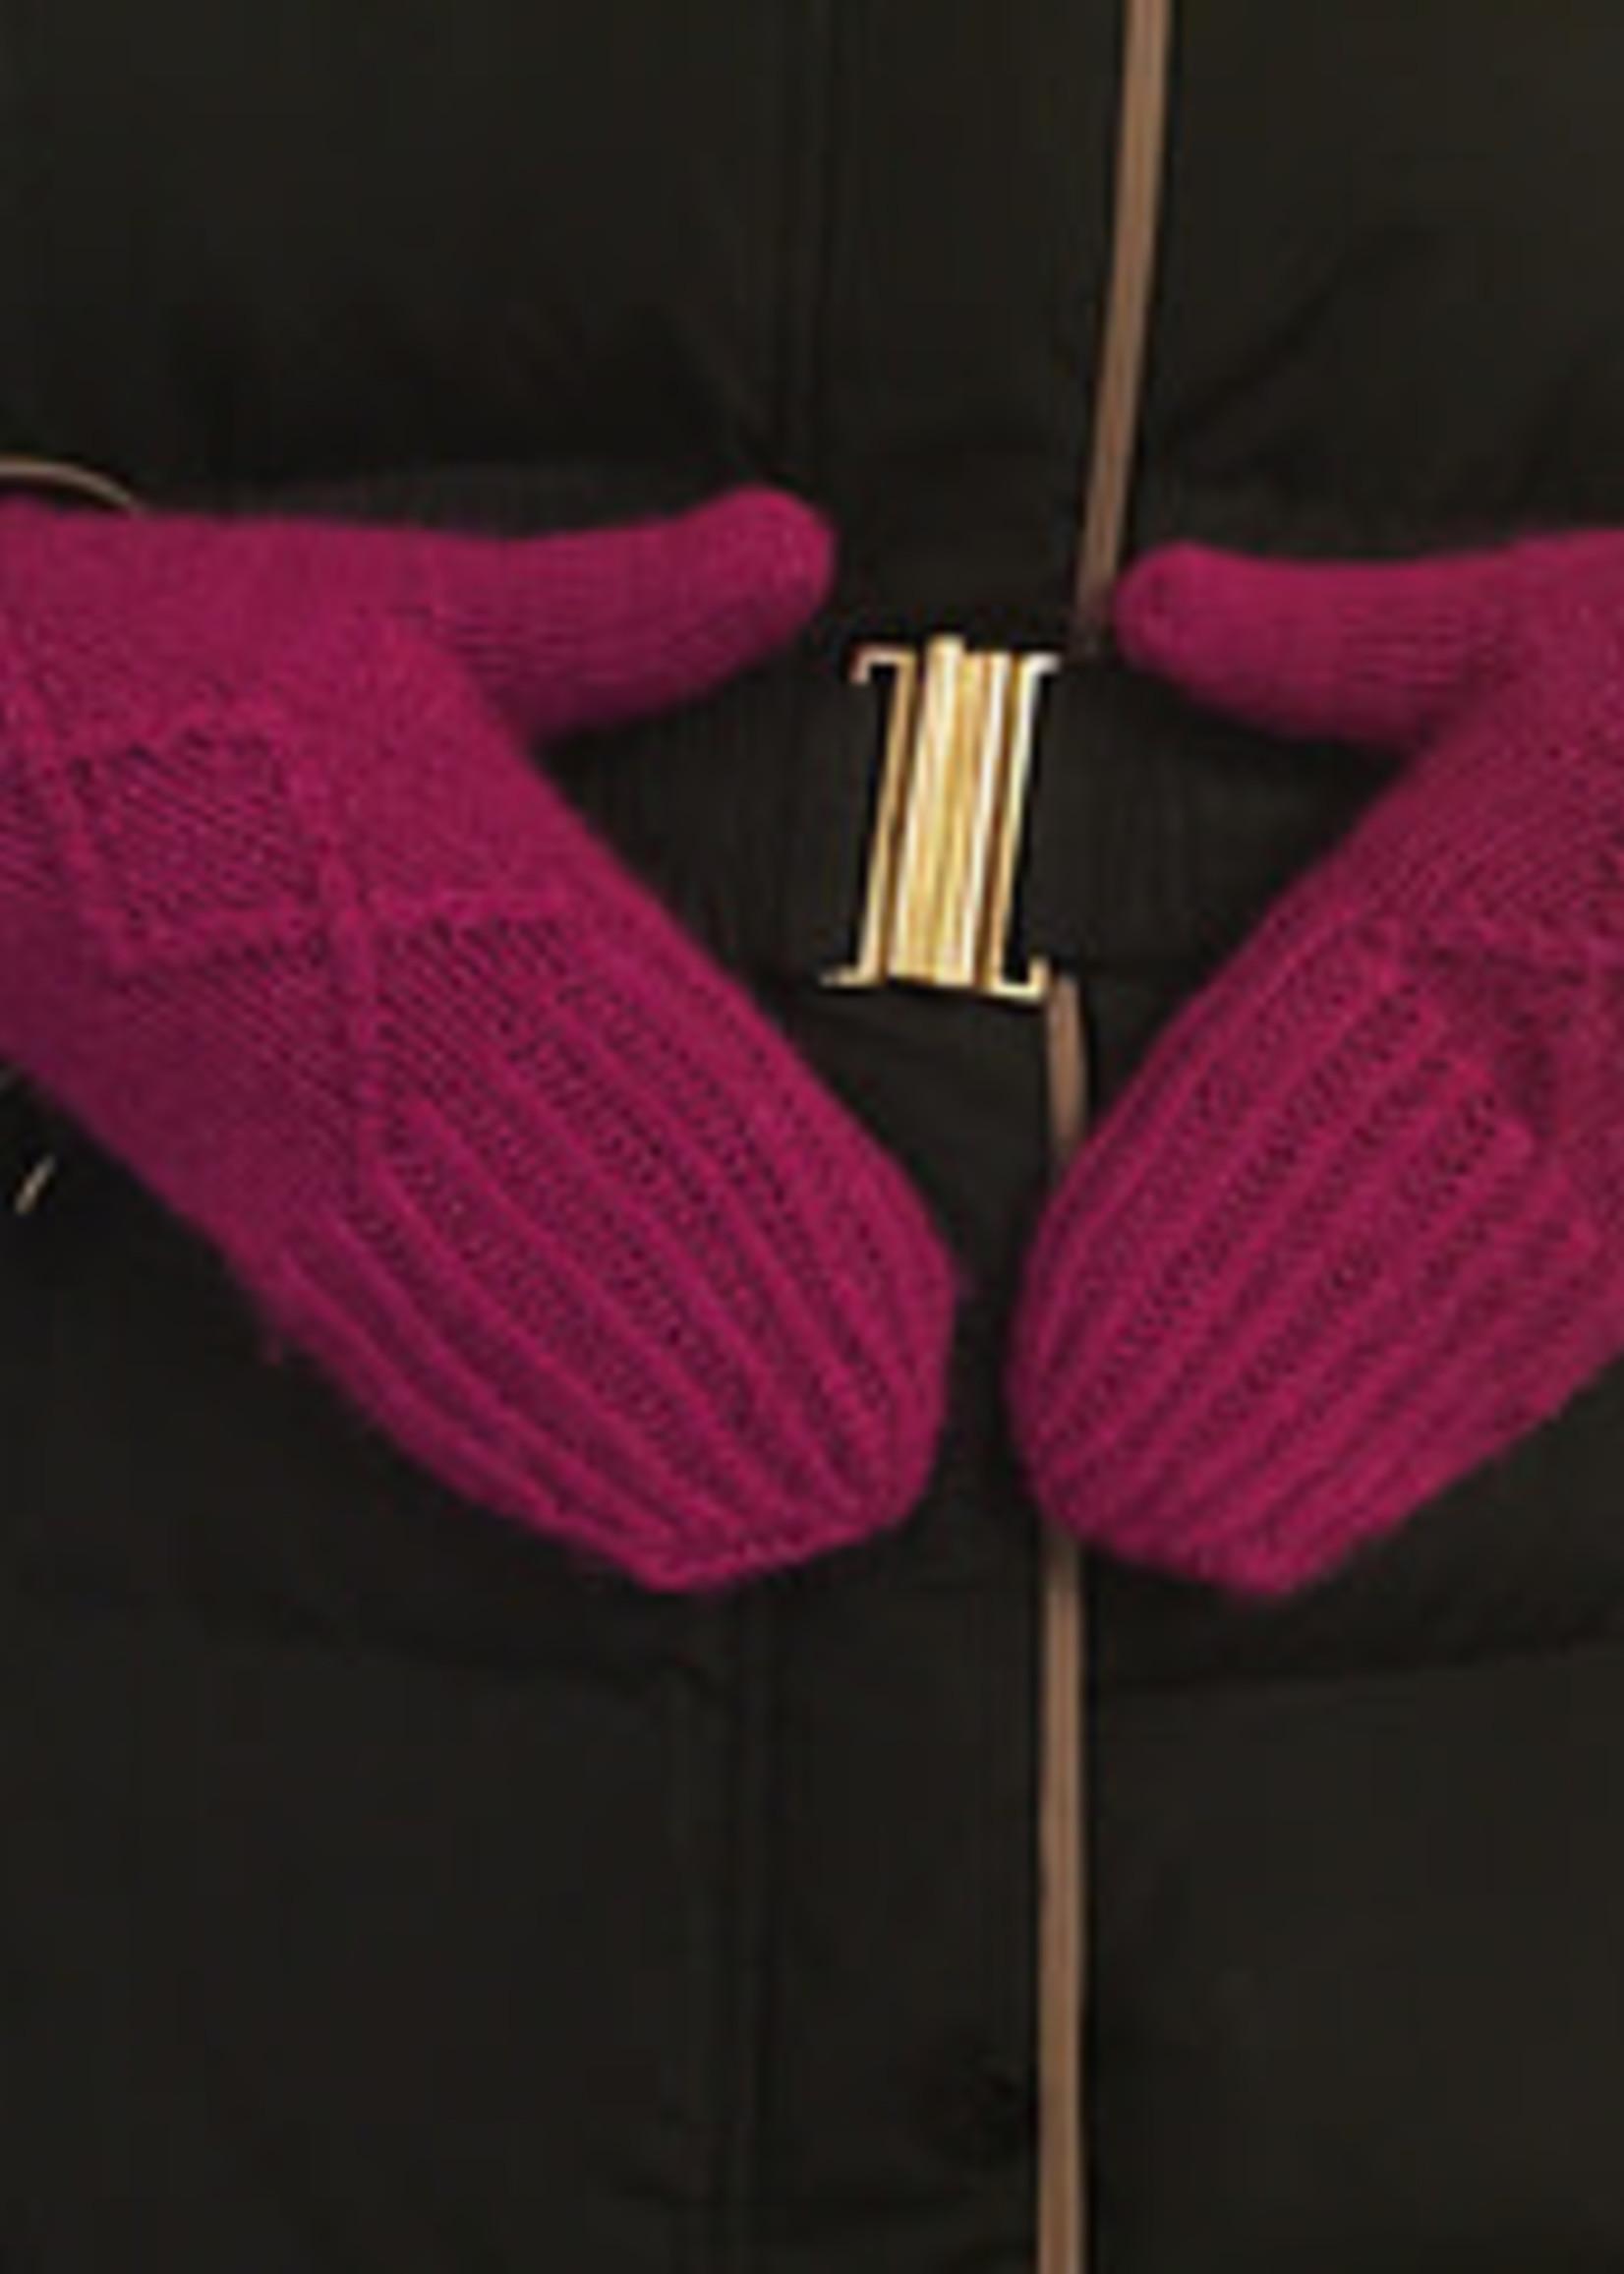 Knox Mountain Knit Co. Knox Mountain Knit Co. - Myra Mittens